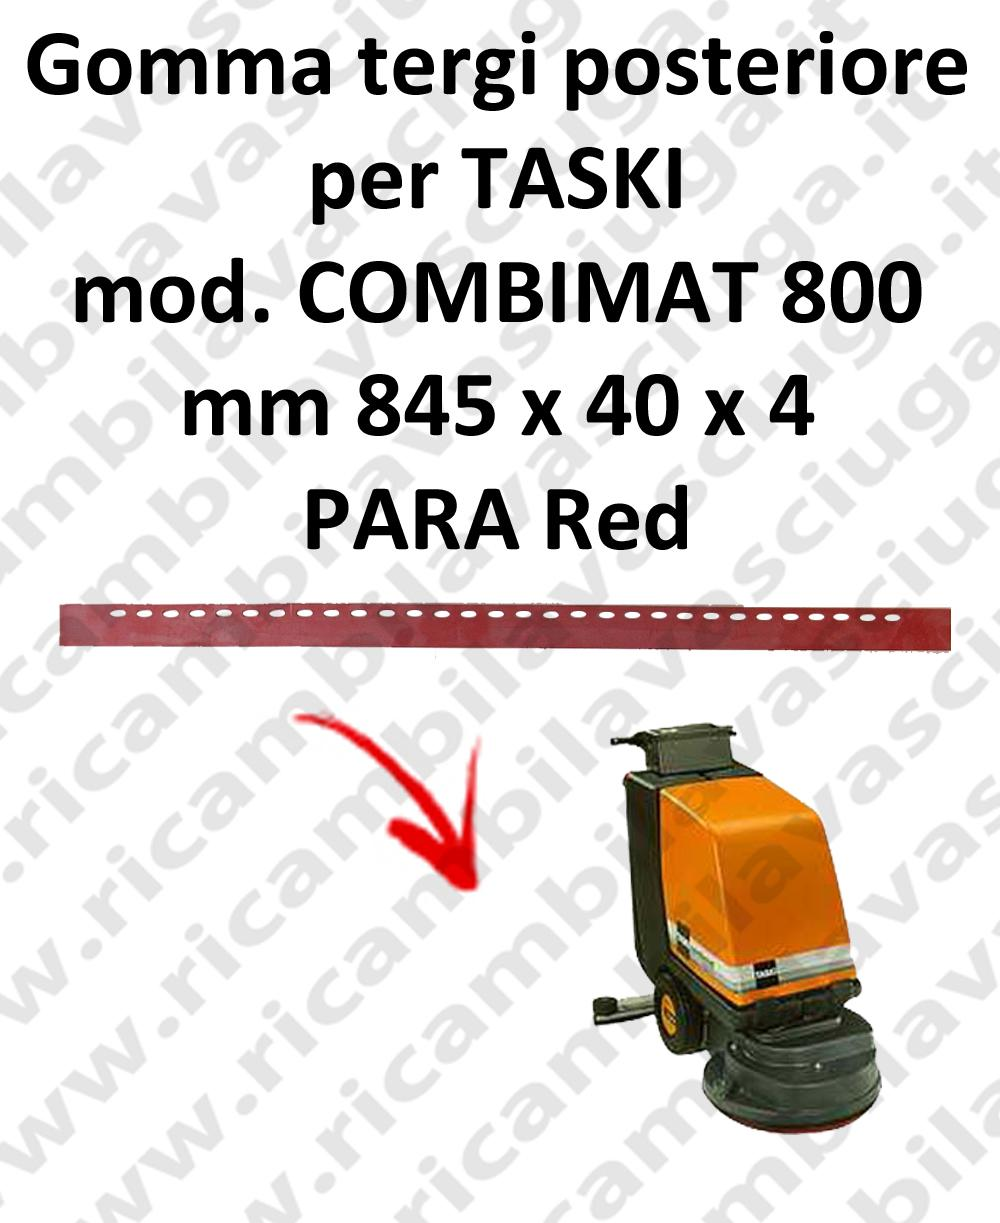 COMBIMAT 800 - GOMMA TERGI posteriore per lavapavimenti TASKI